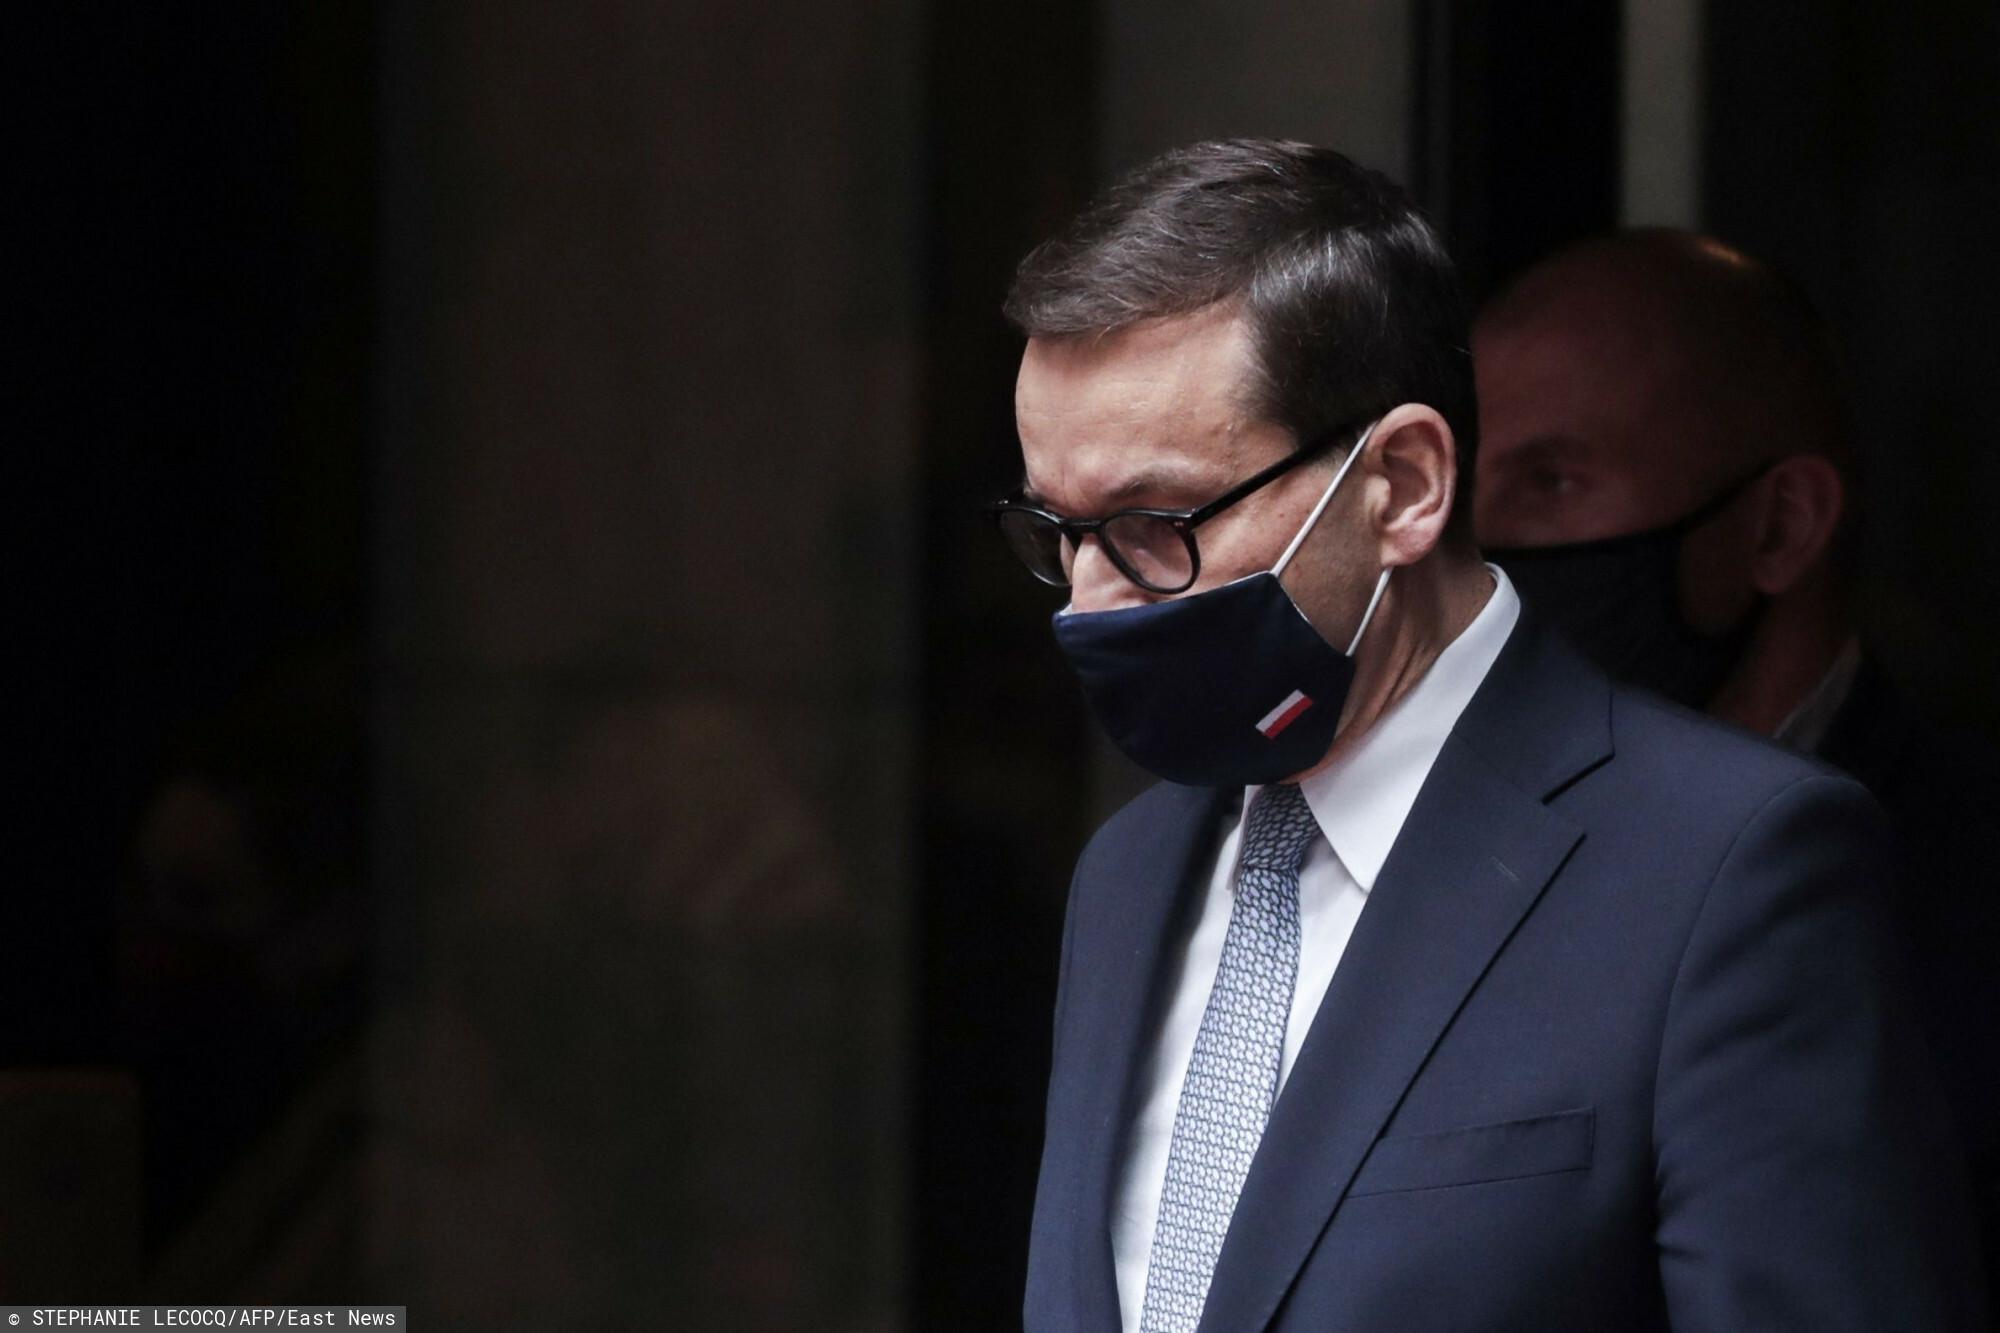 STEPHANIE LECOCQ/AFP/East News